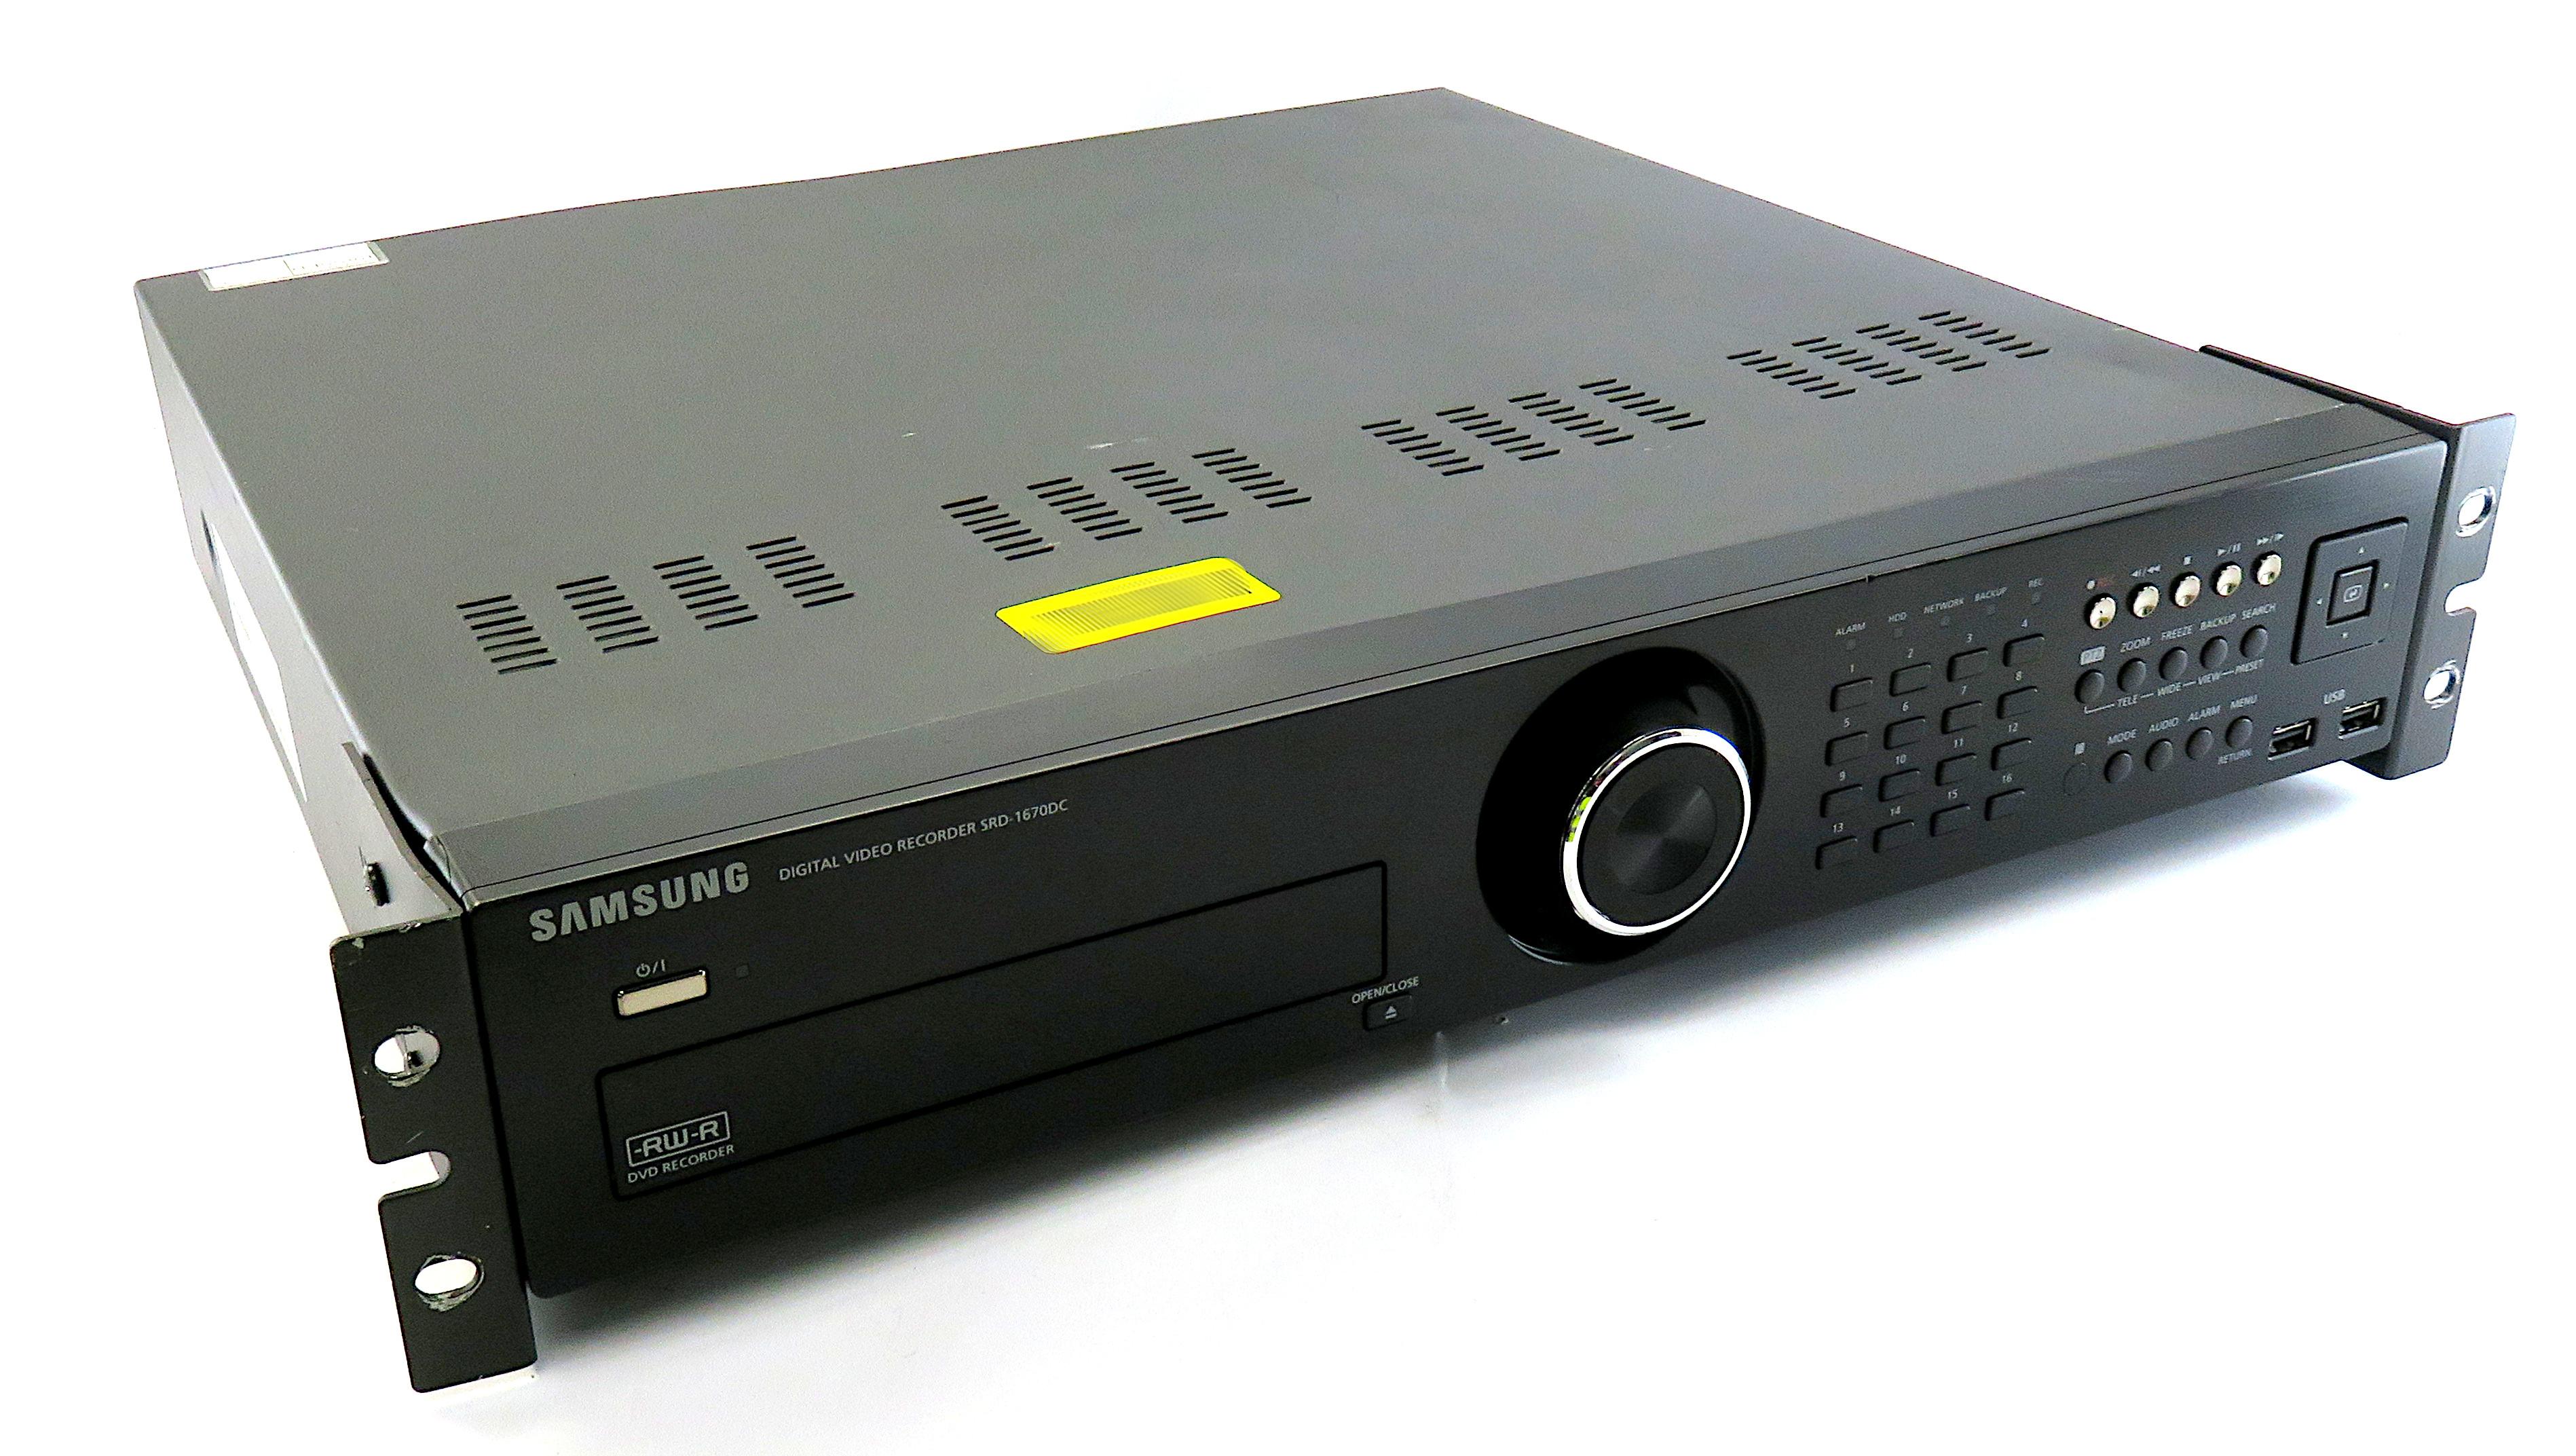 Samsung SRD-1670DCP 16 Channel Digital Video Recorder CCTV H.264 - NO HDD